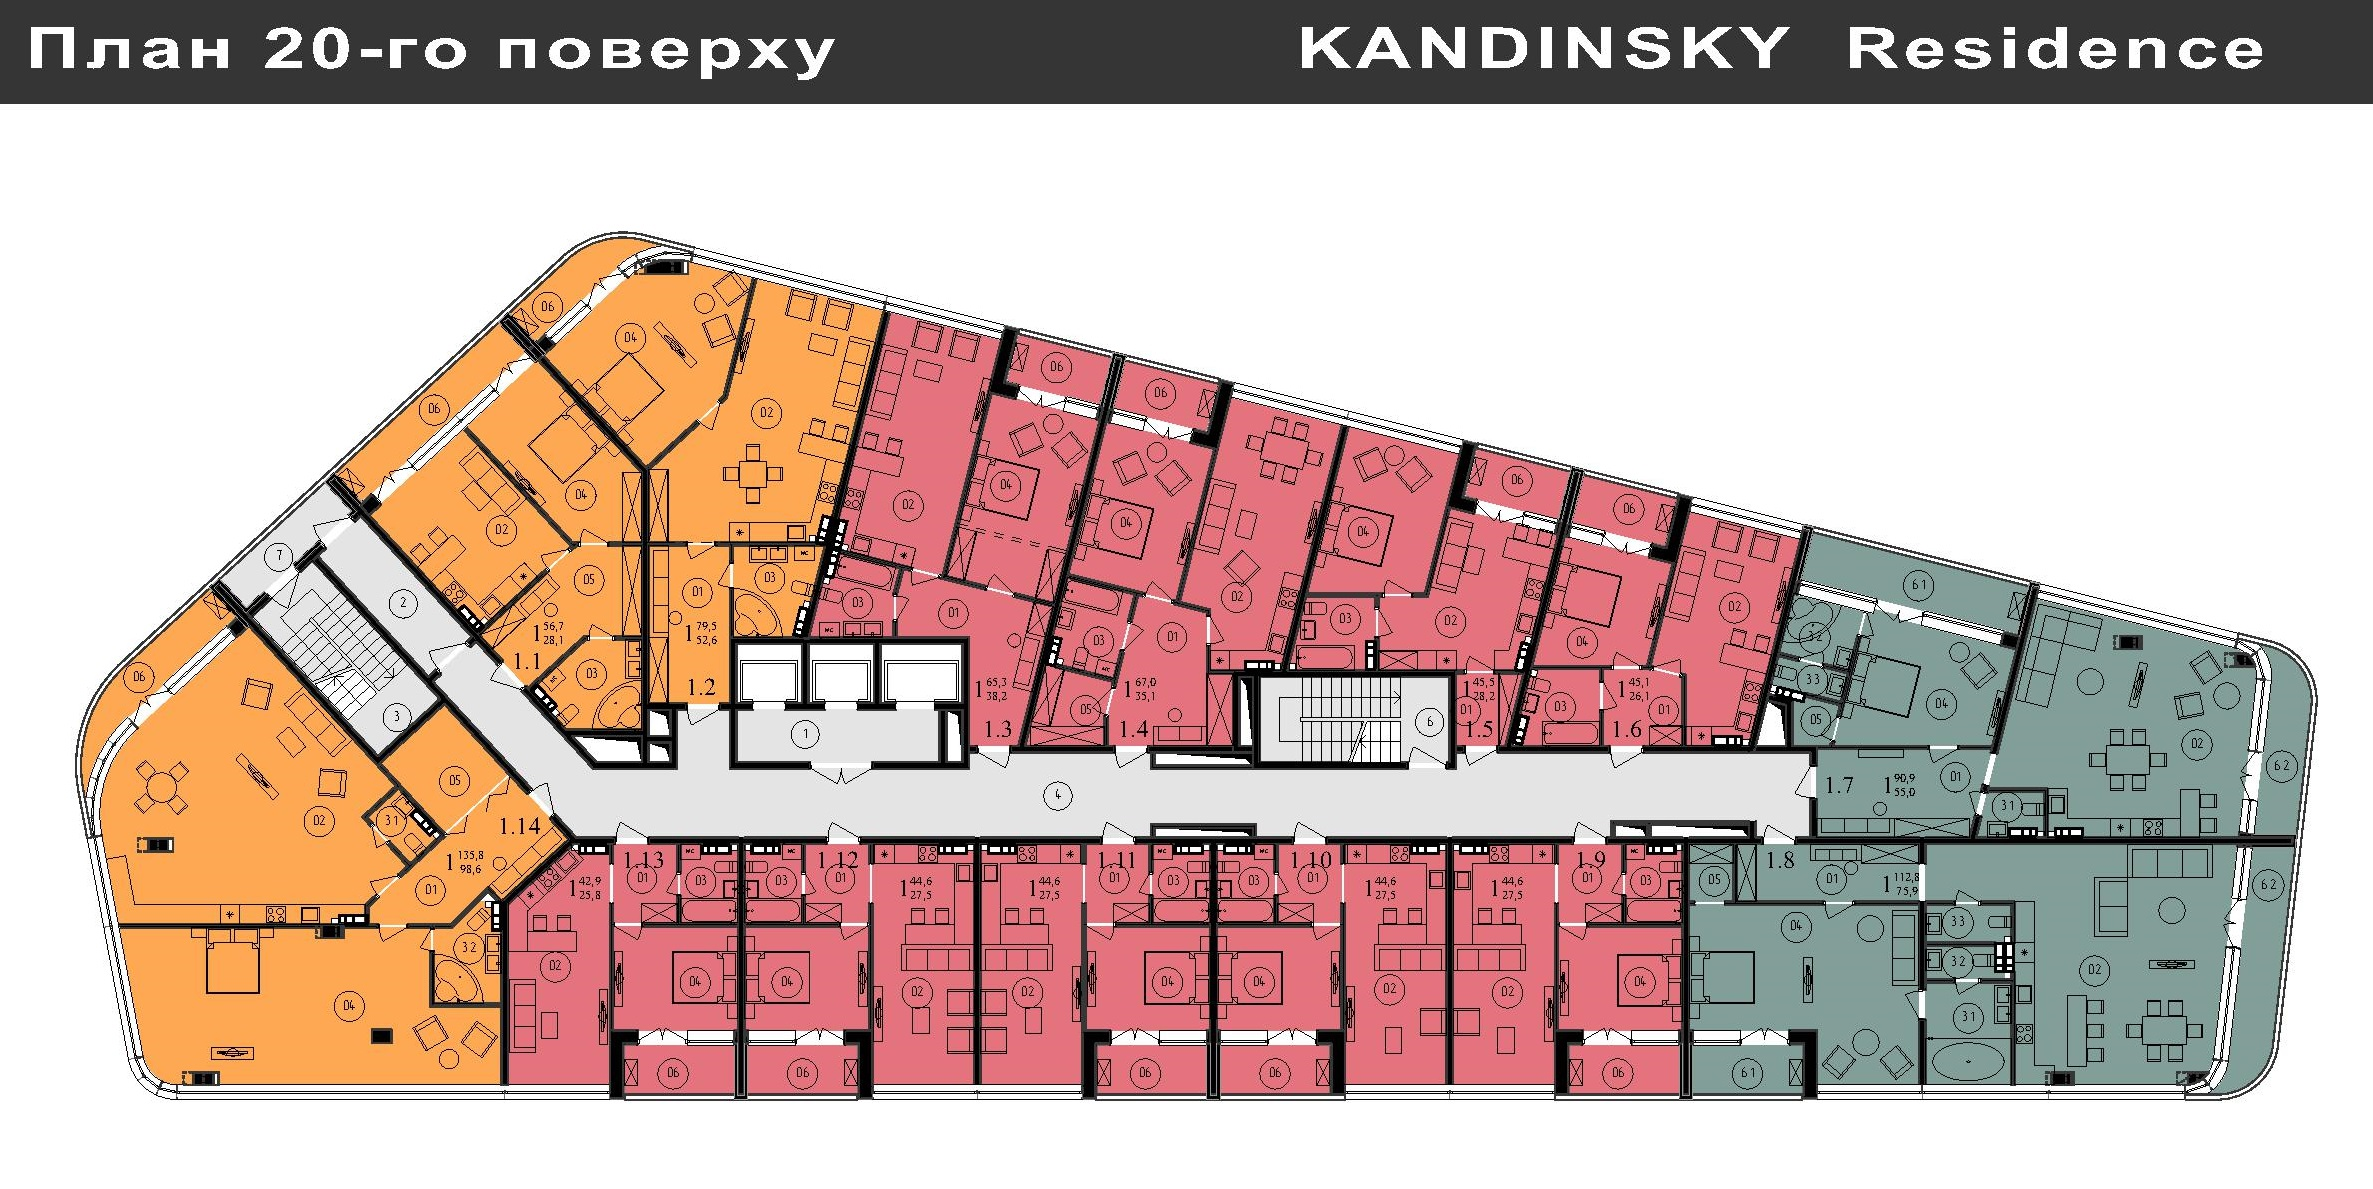 ЖК Кандинский План 20-го этажа